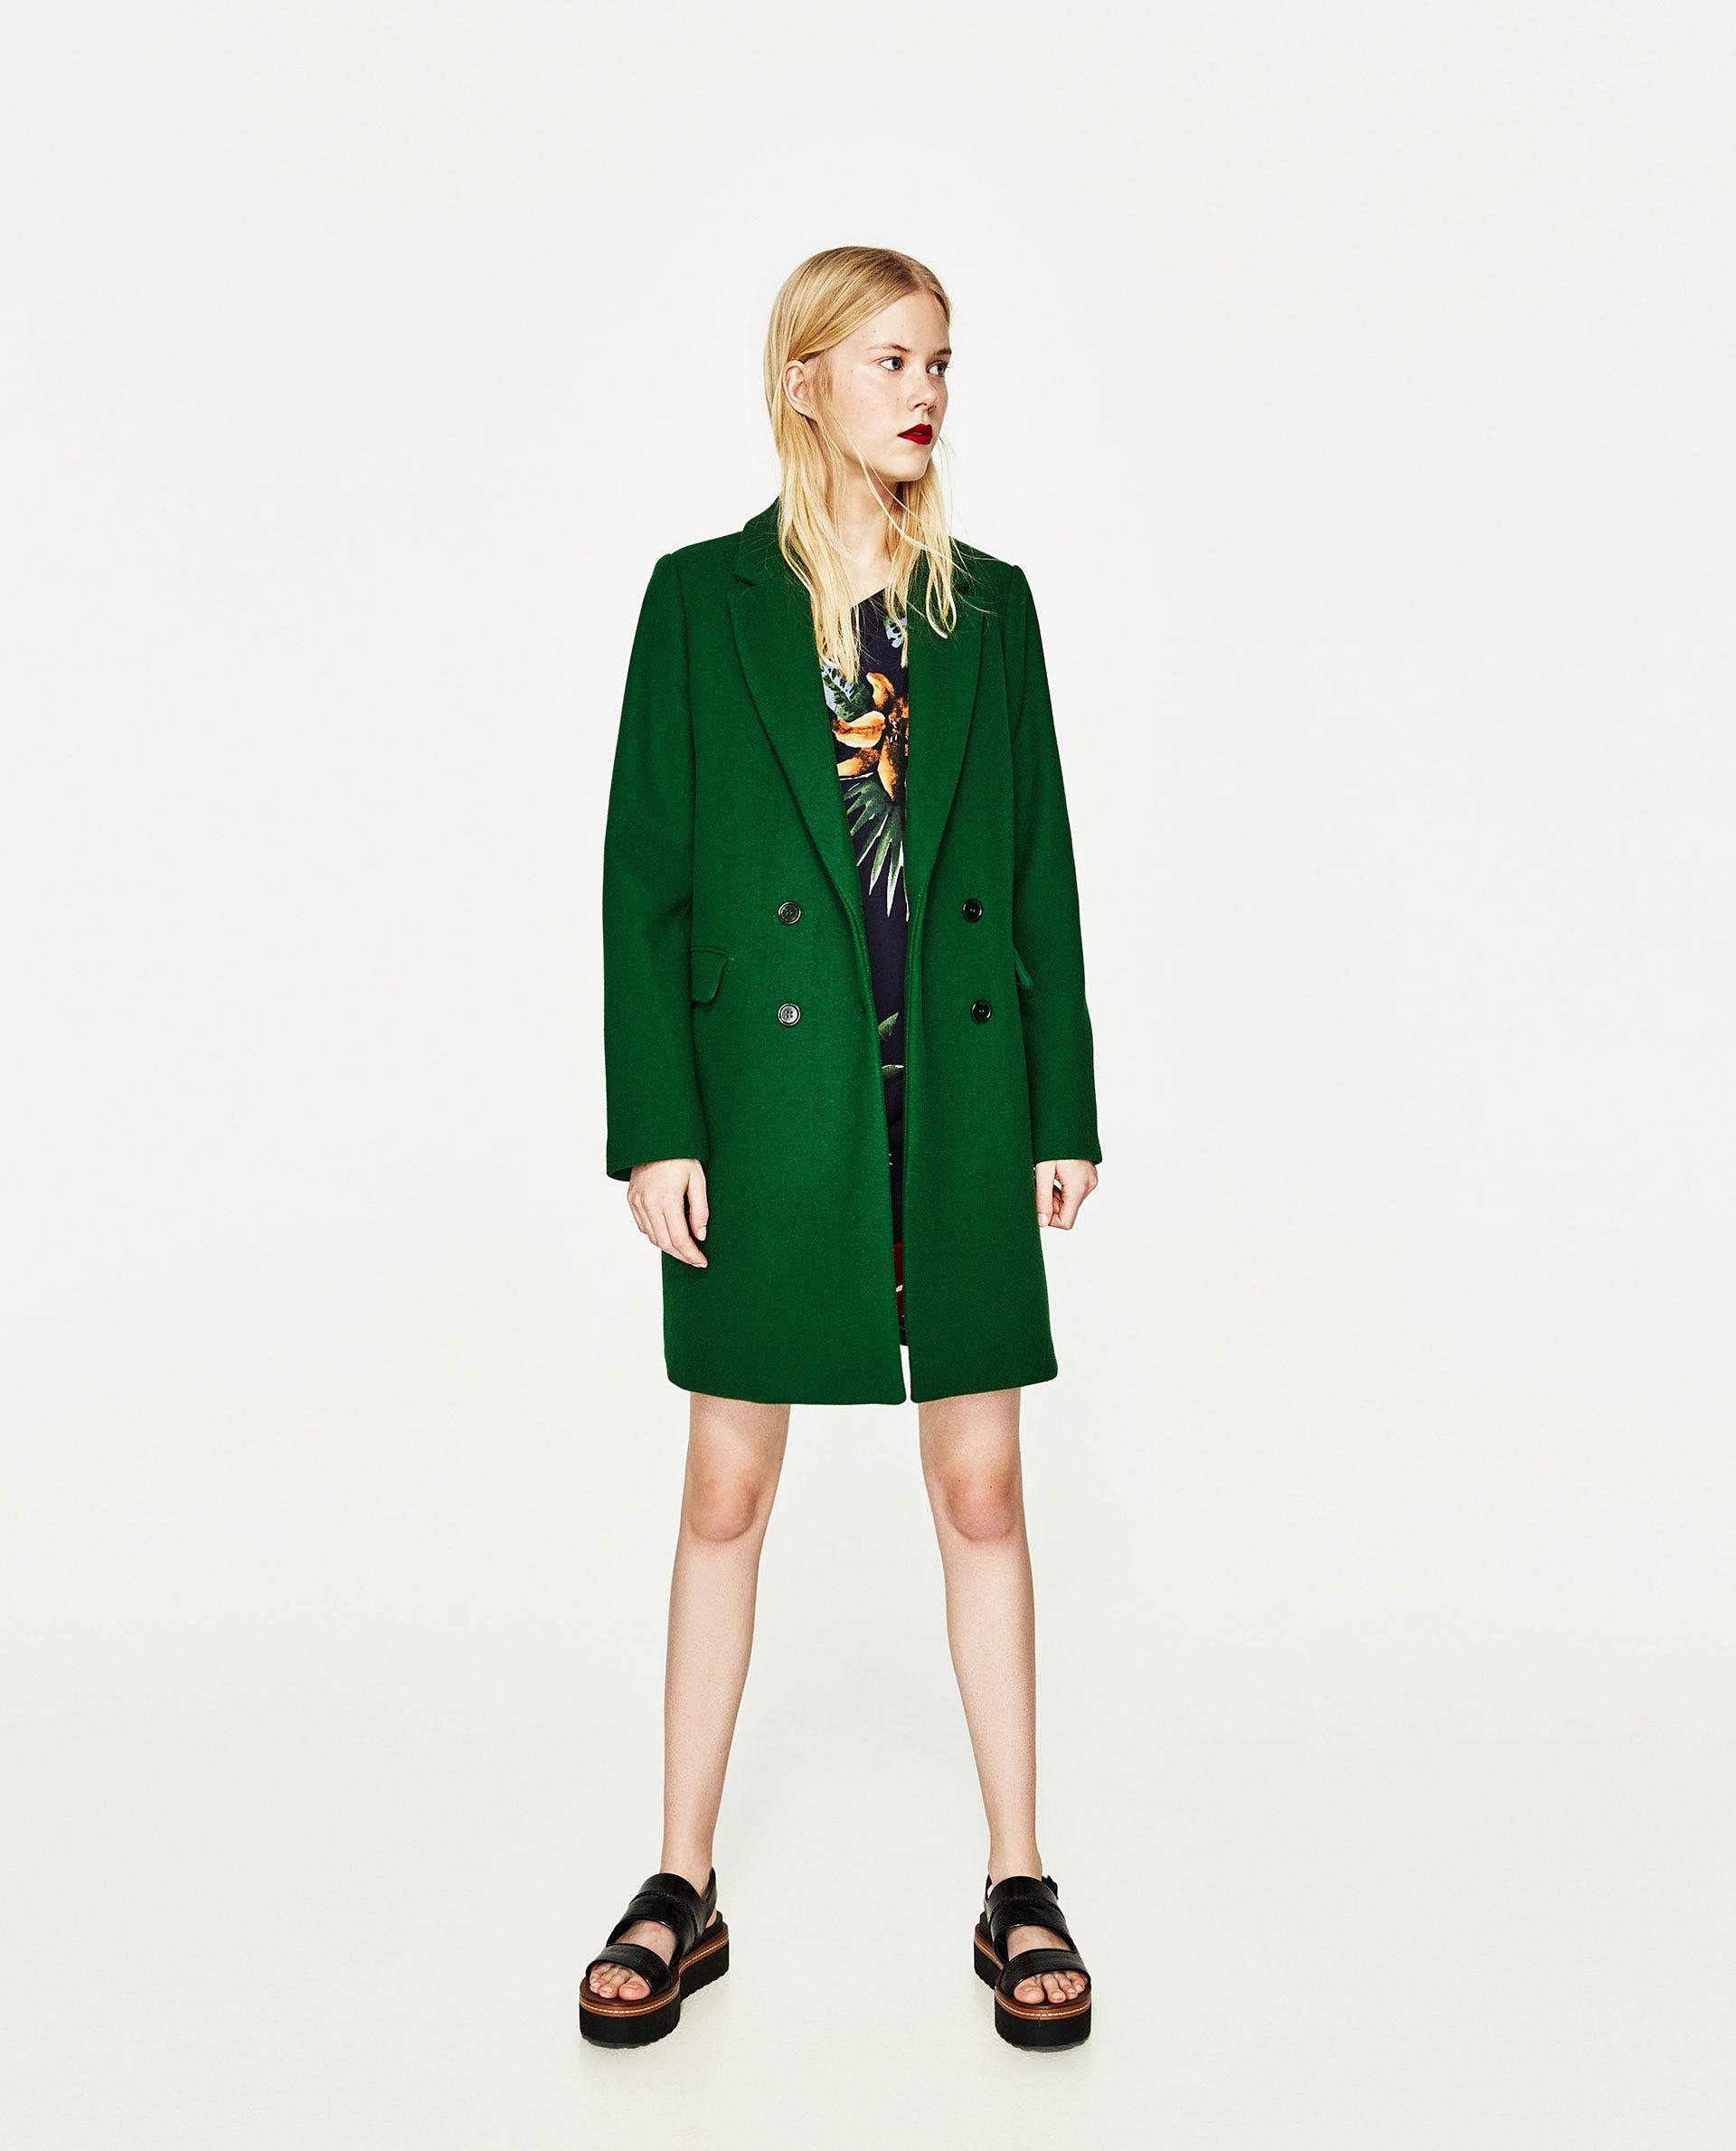 32ef9d1275 Zara clothing online shopping uk